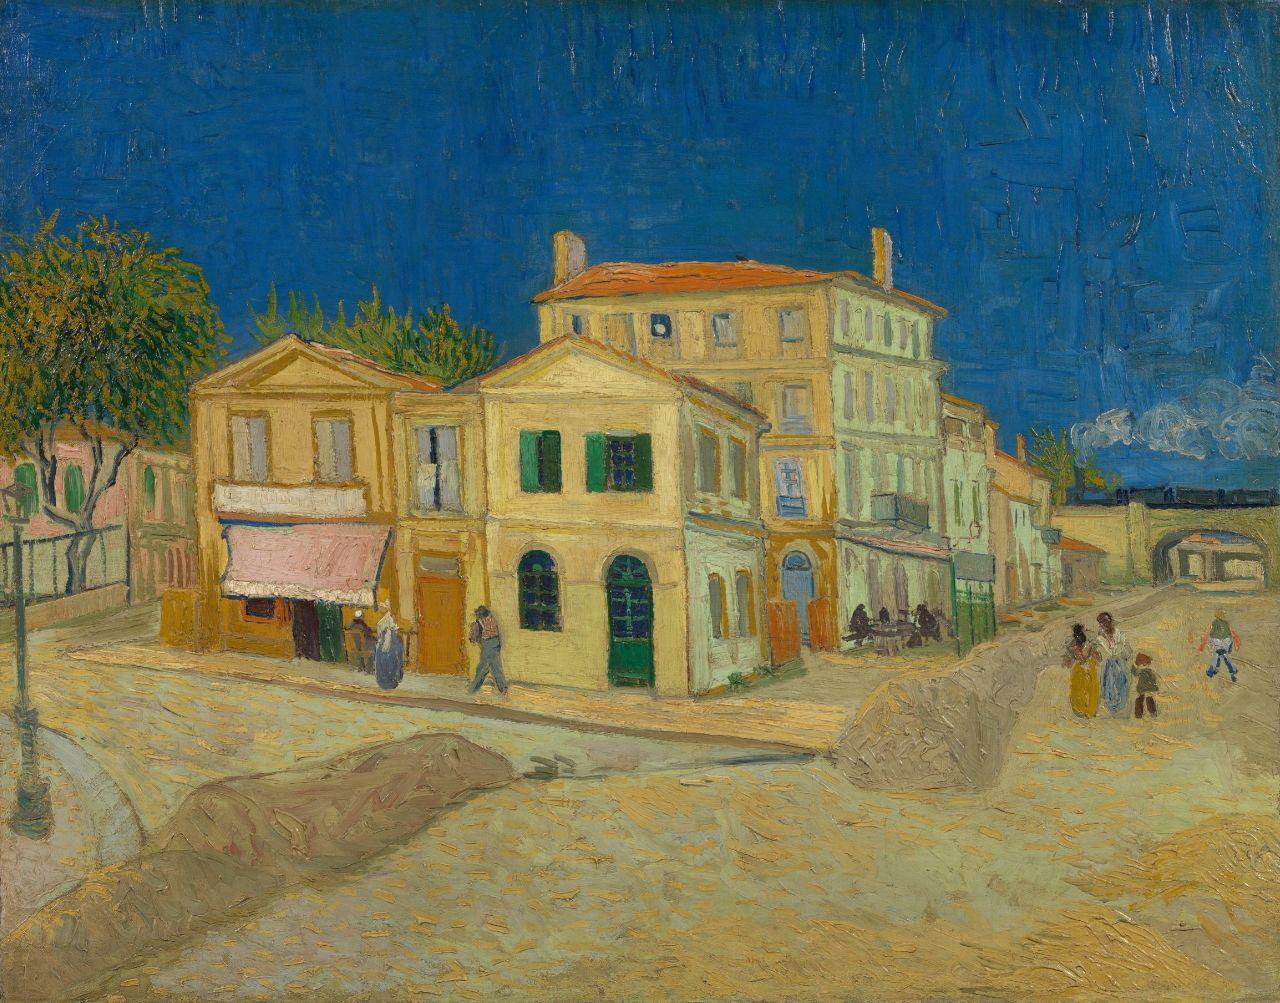 Vincent van Gogh - The Yellow House (The Street) - Van Gogh Museum